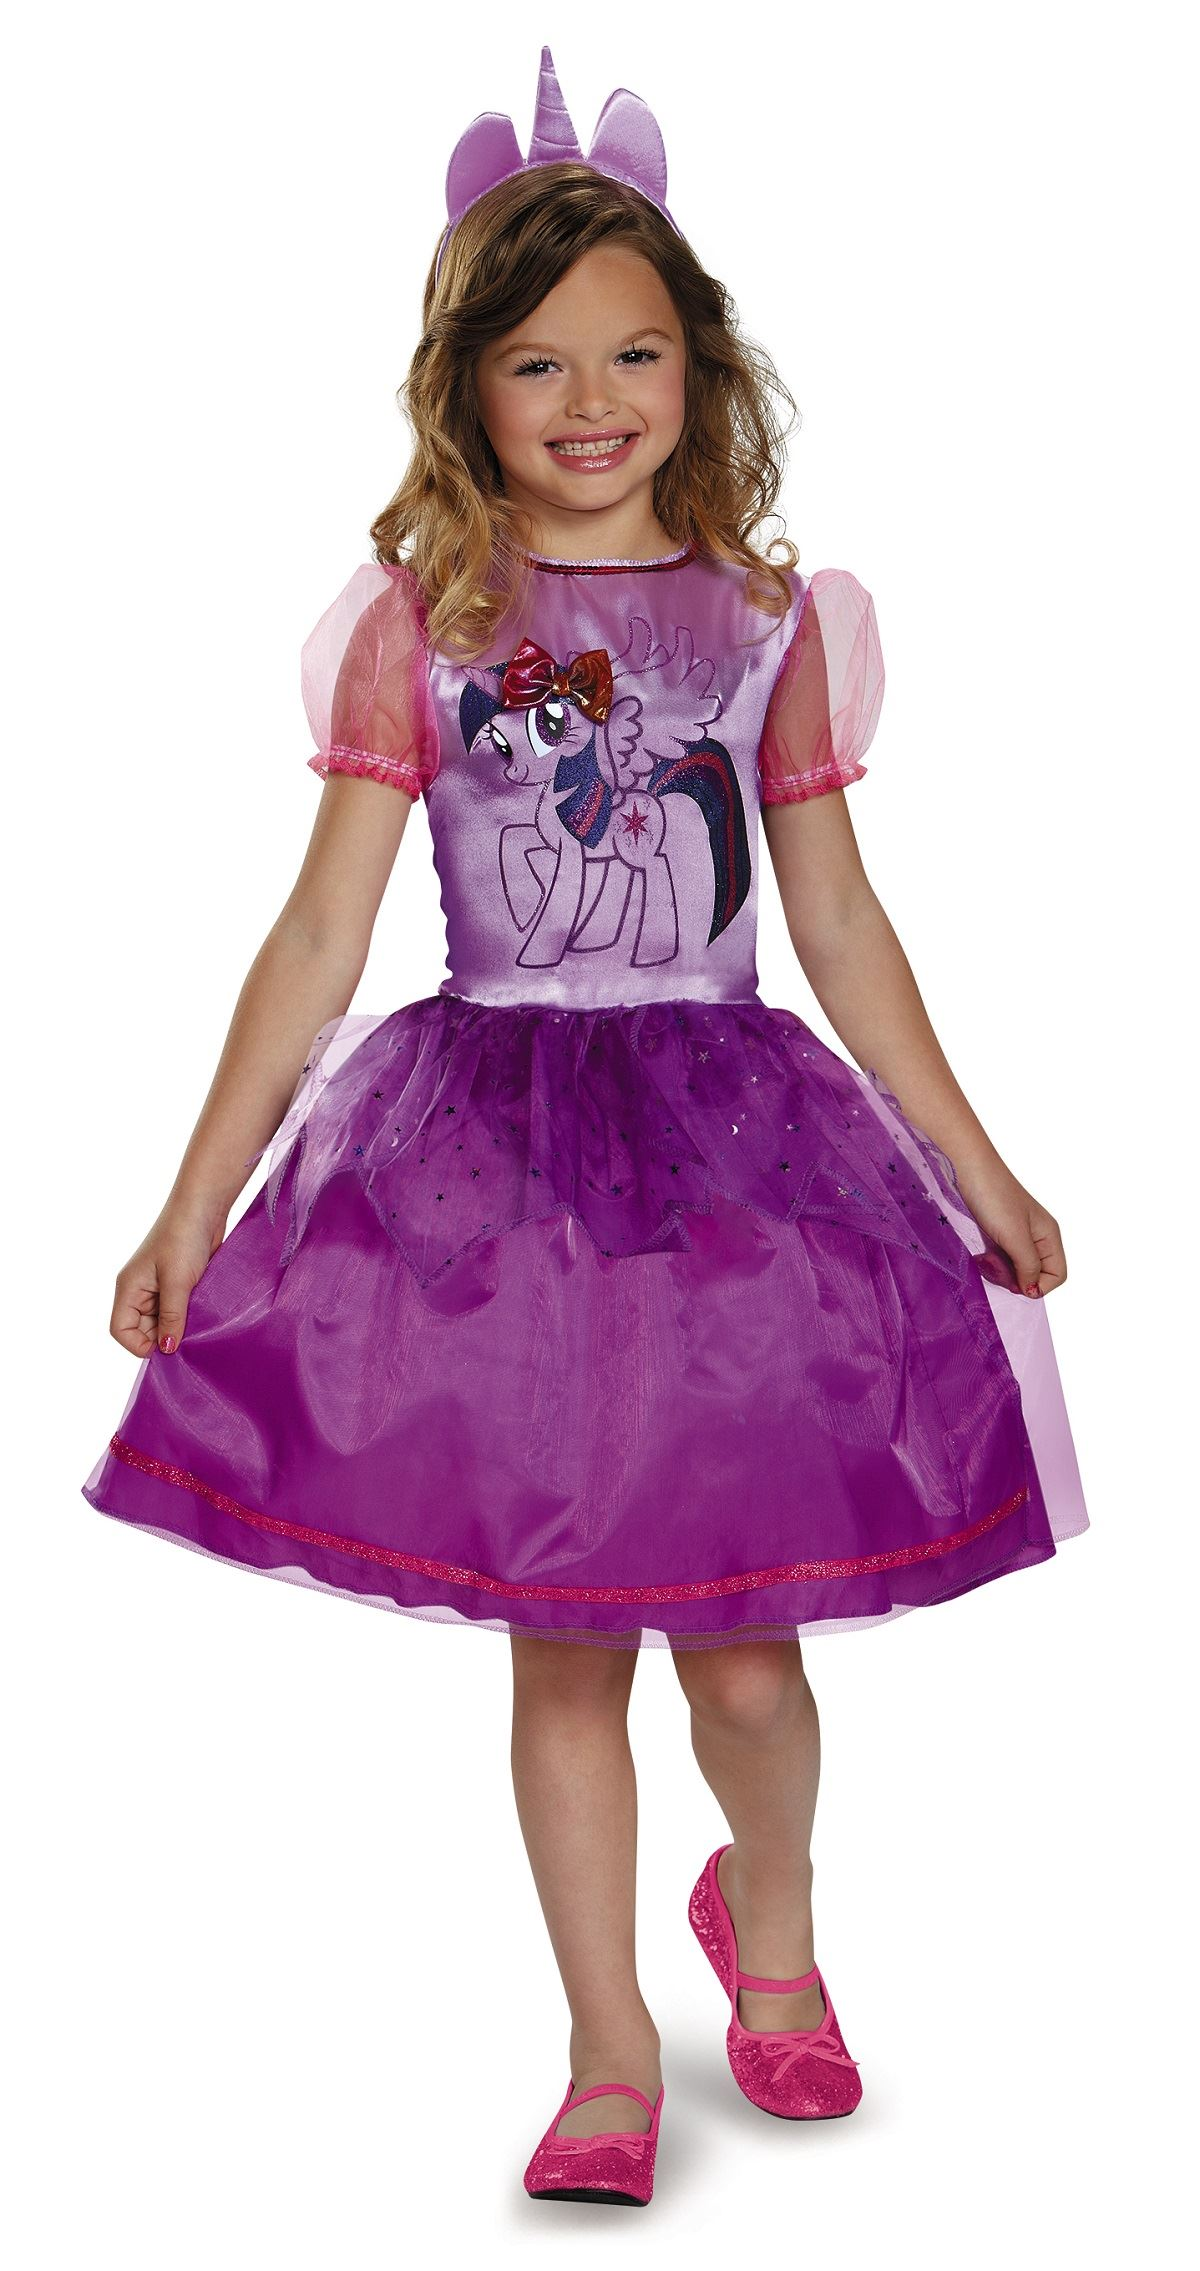 Kids Twilight Sparkle My Little Pony Girls Costume  sc 1 st  The Costume Land & Kids Twilight Sparkle My Little Pony Girls Costume | $19.99 | The ...